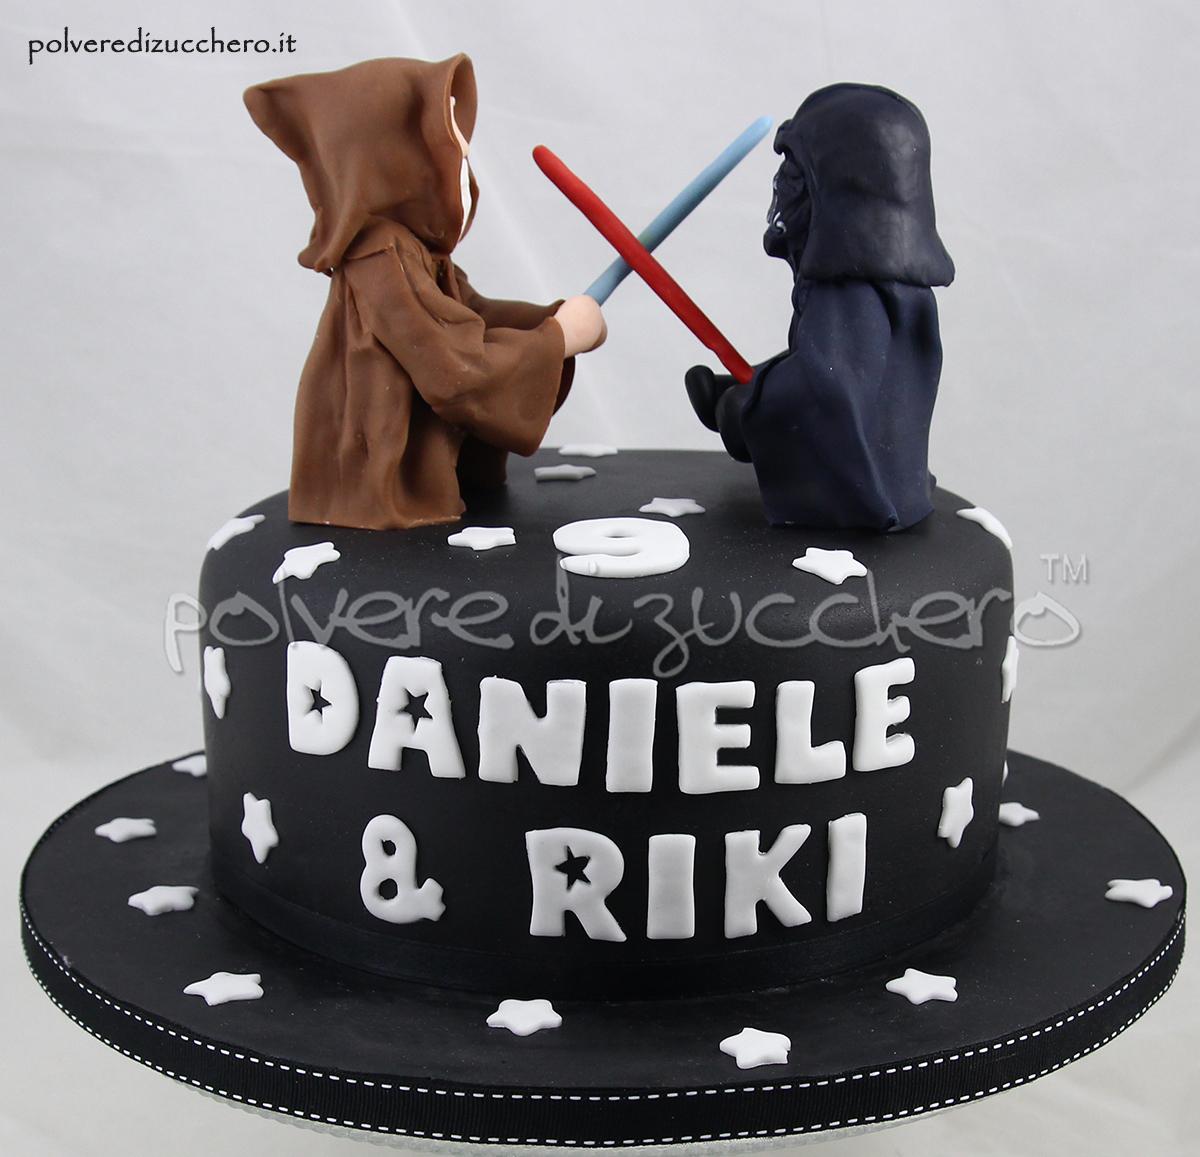 Favorito Torta compleanno Star Wars: Darth Vader e Obi Wan Kenobi  ST79